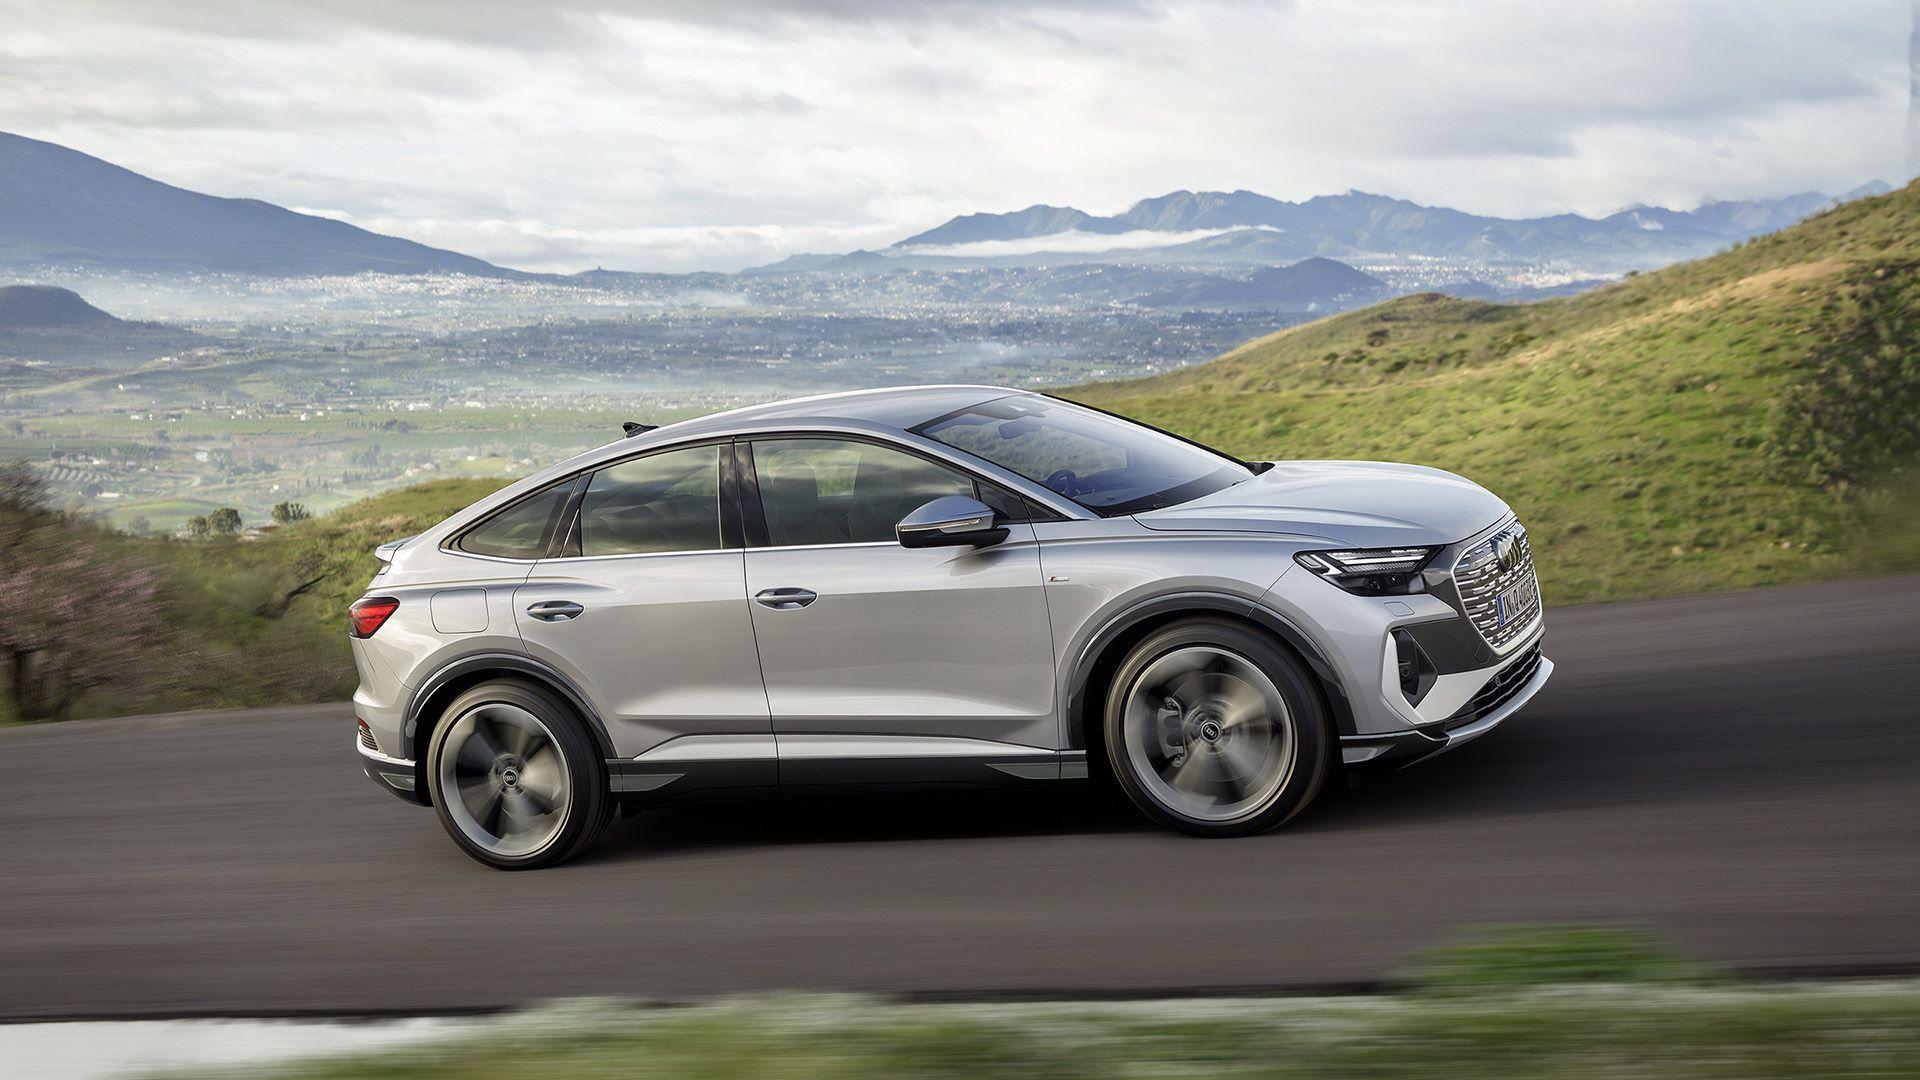 Audi-Q4-e-tron-and-Q4-e-tron-Sportback-27